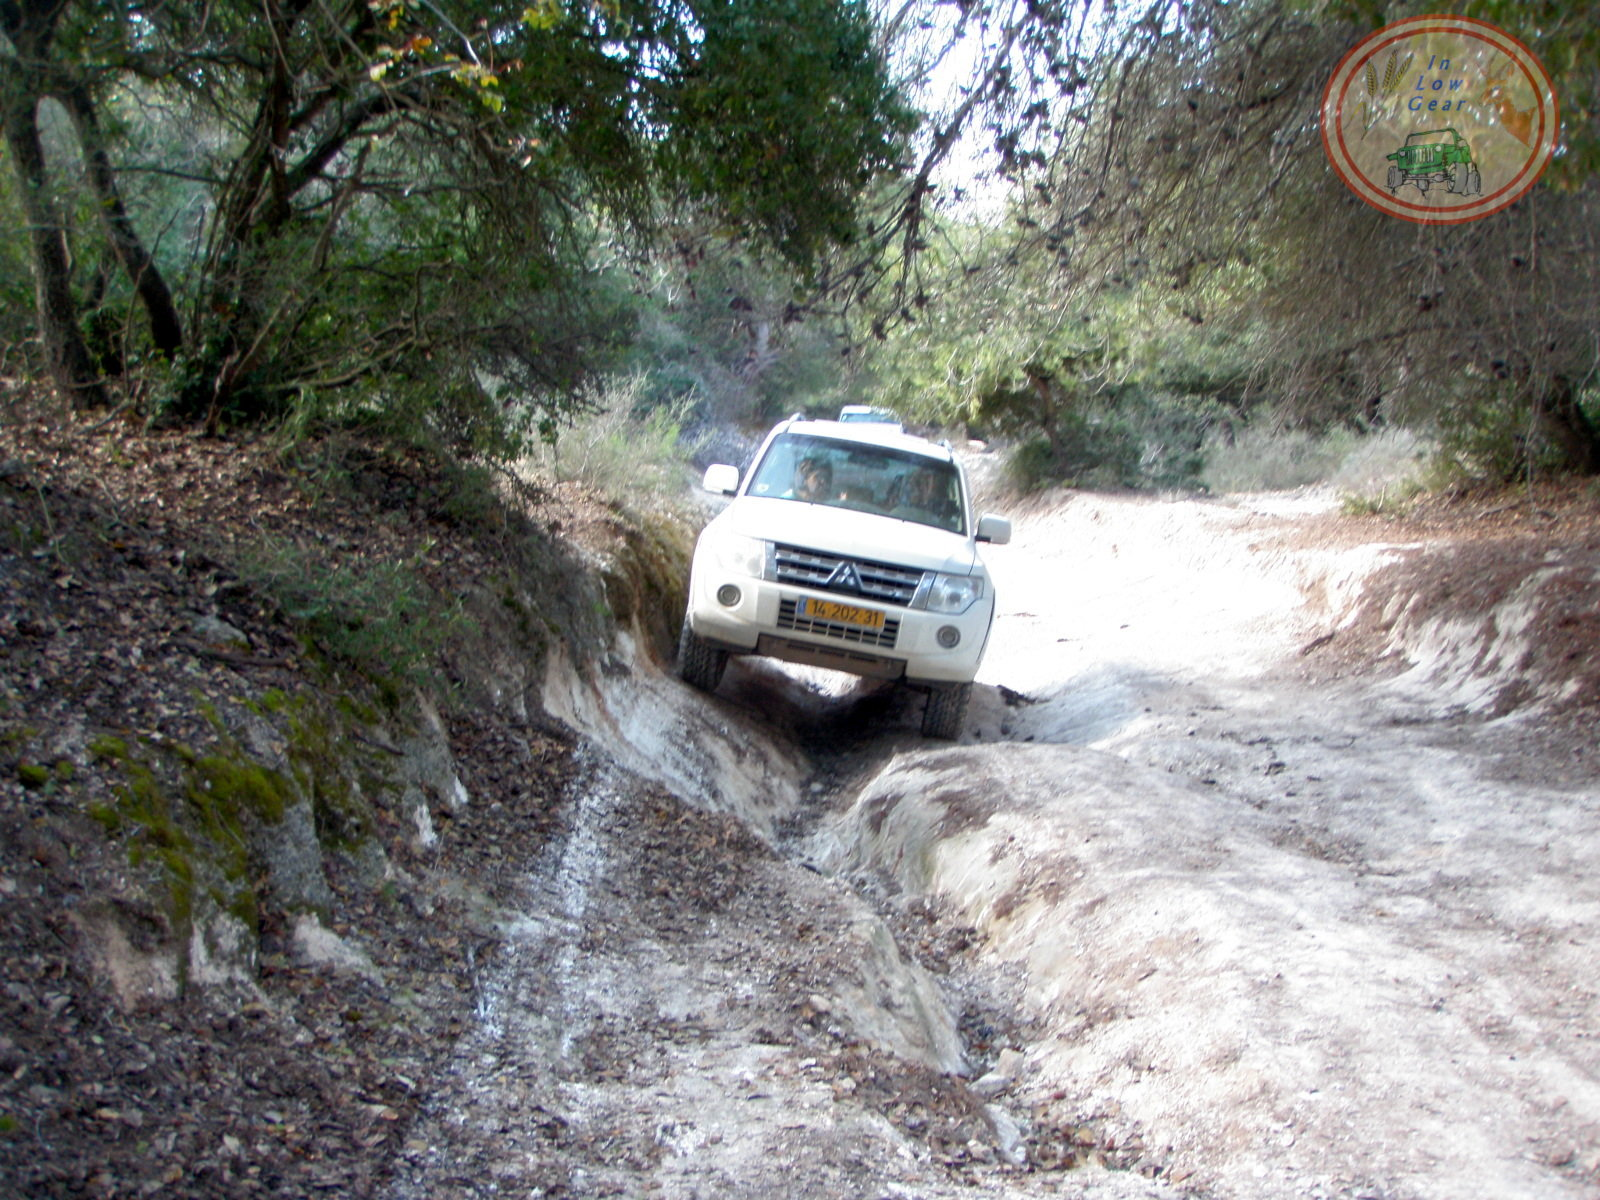 Ramot Menashe jeep tour review. ביקורת, חוות דעת טיולי ג'יפים רמות מנשה